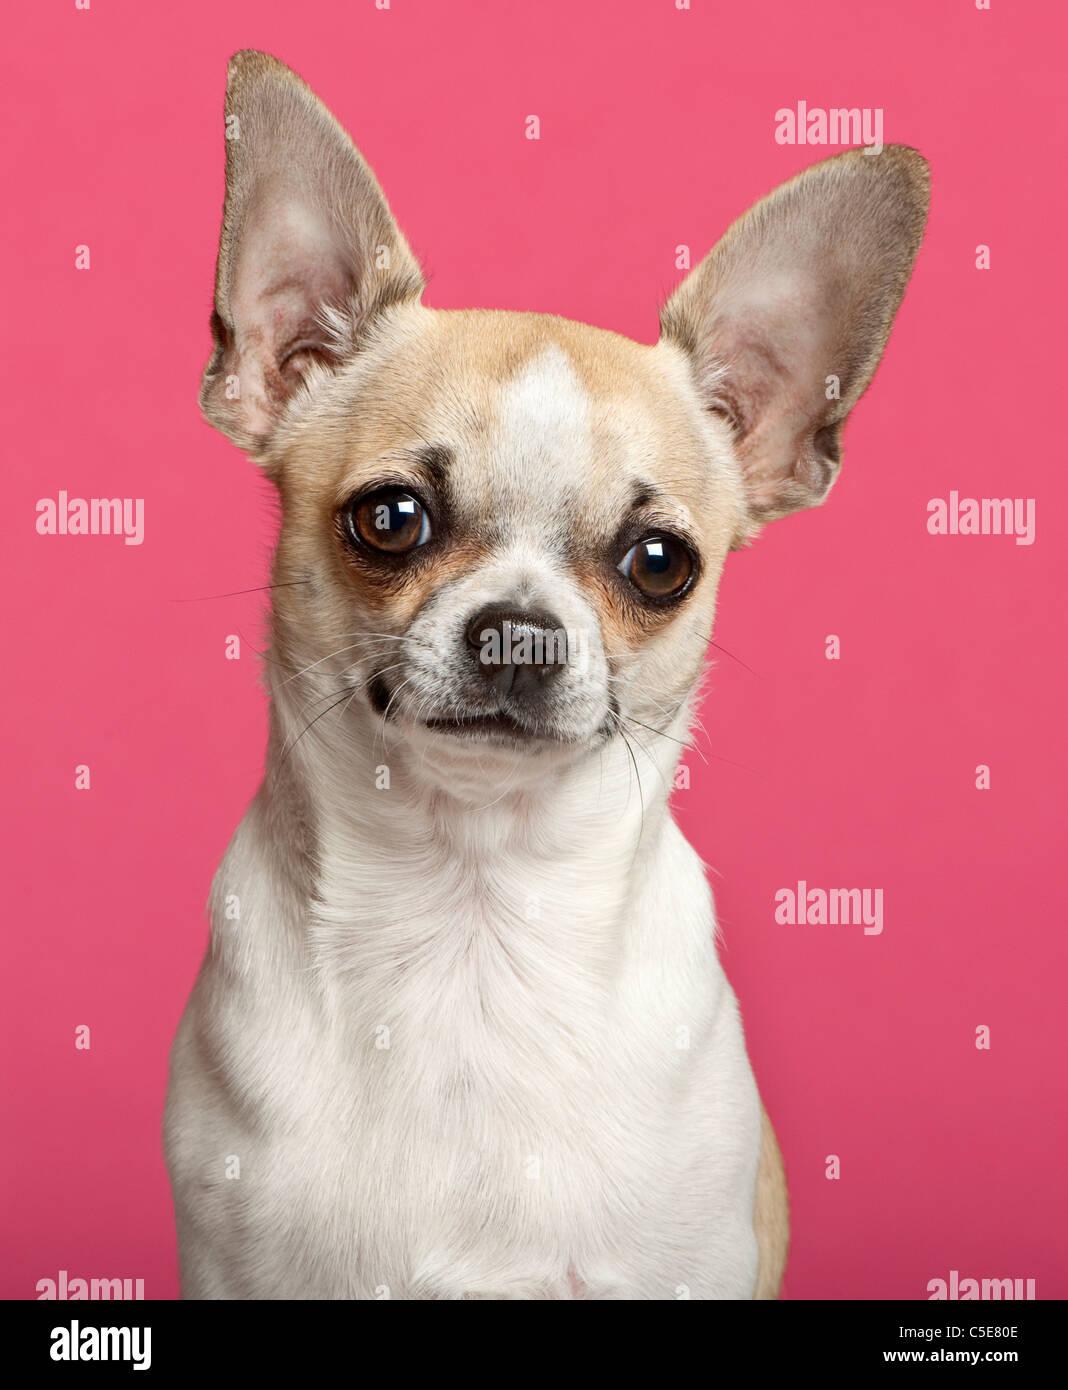 Close-up di Chihuahua, 9 mesi di età, davanti a sfondo rosa Immagini Stock